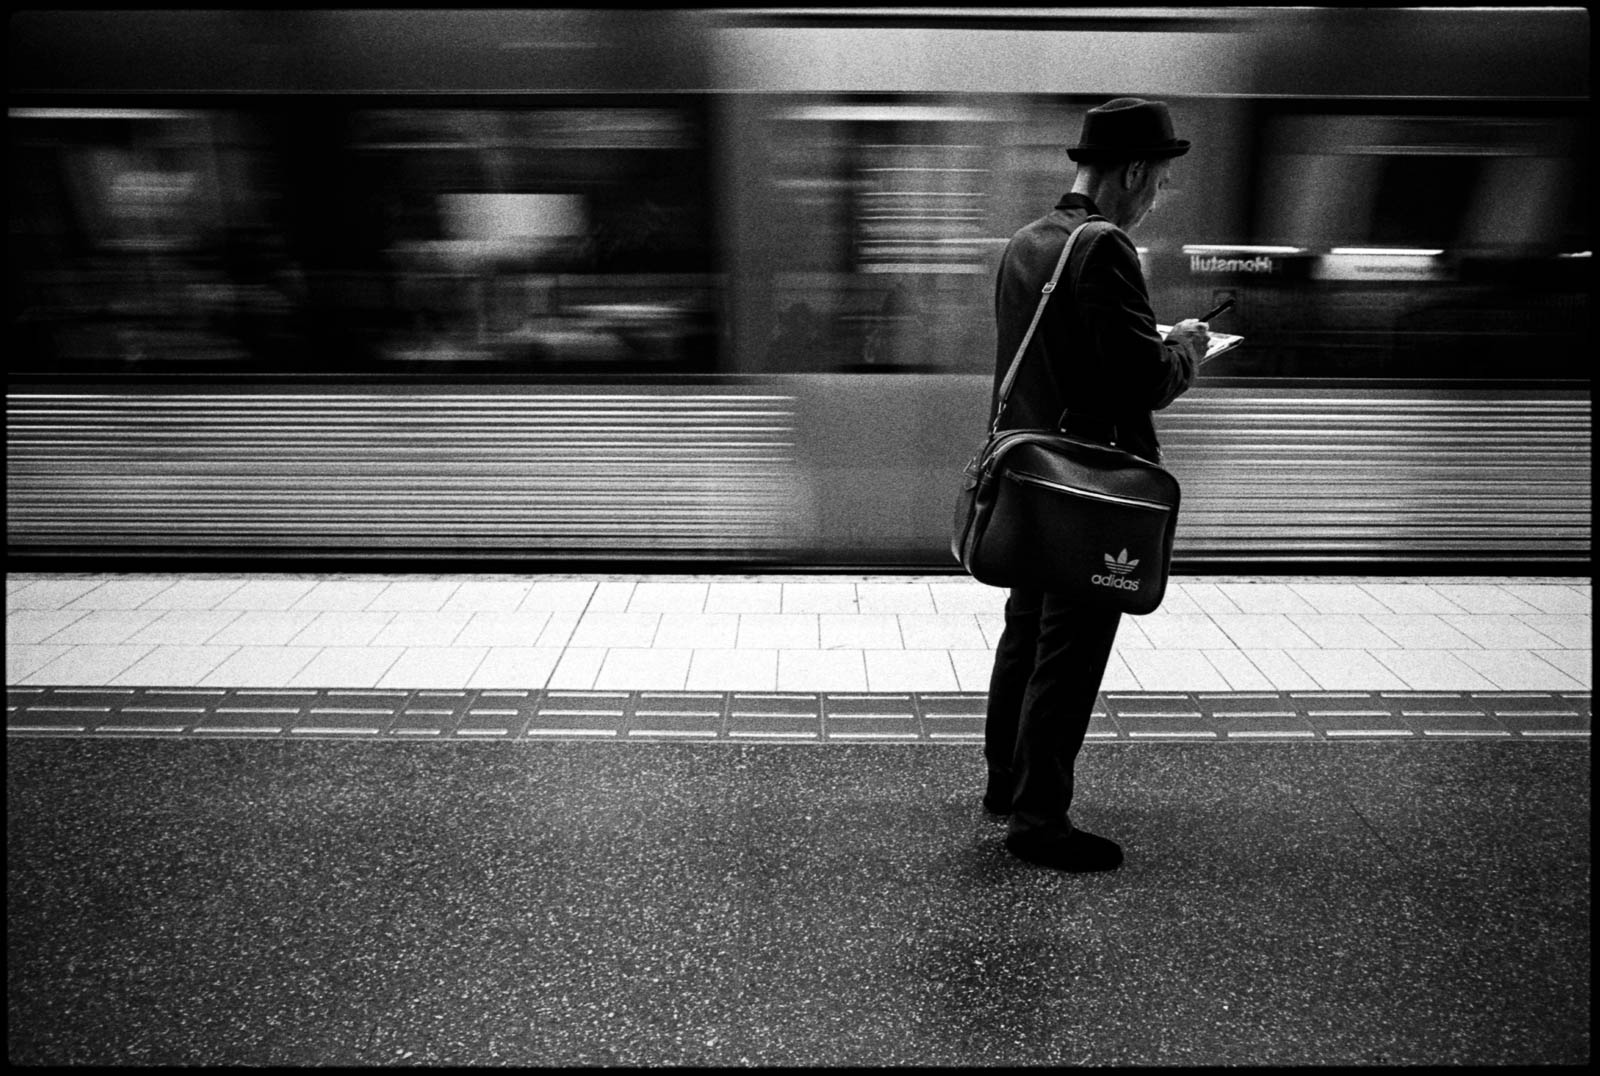 #0287_14 -  Hornstull Tunnelbana. Stockholm, 2014.